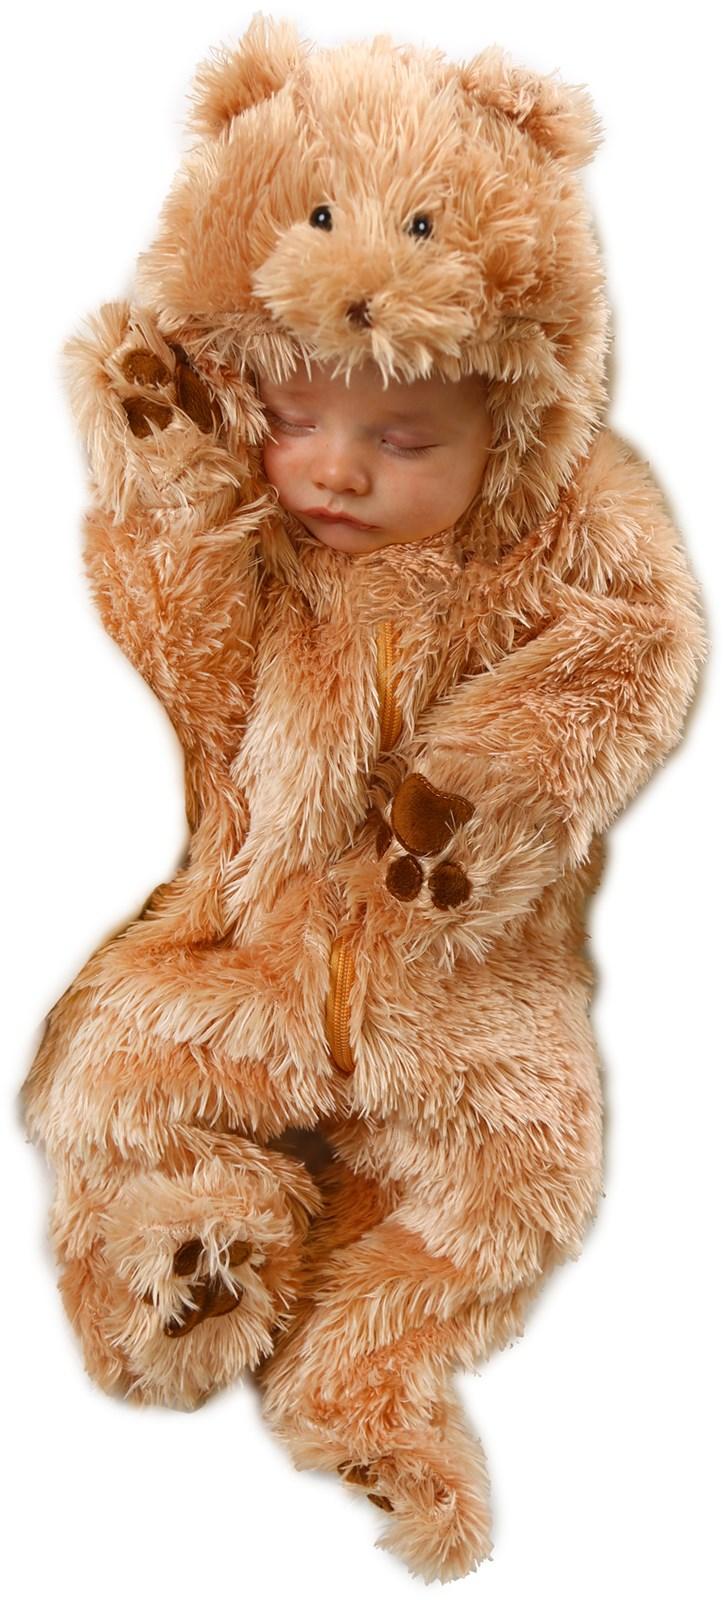 Snuggle Bear Jumpsuit Infant Costume